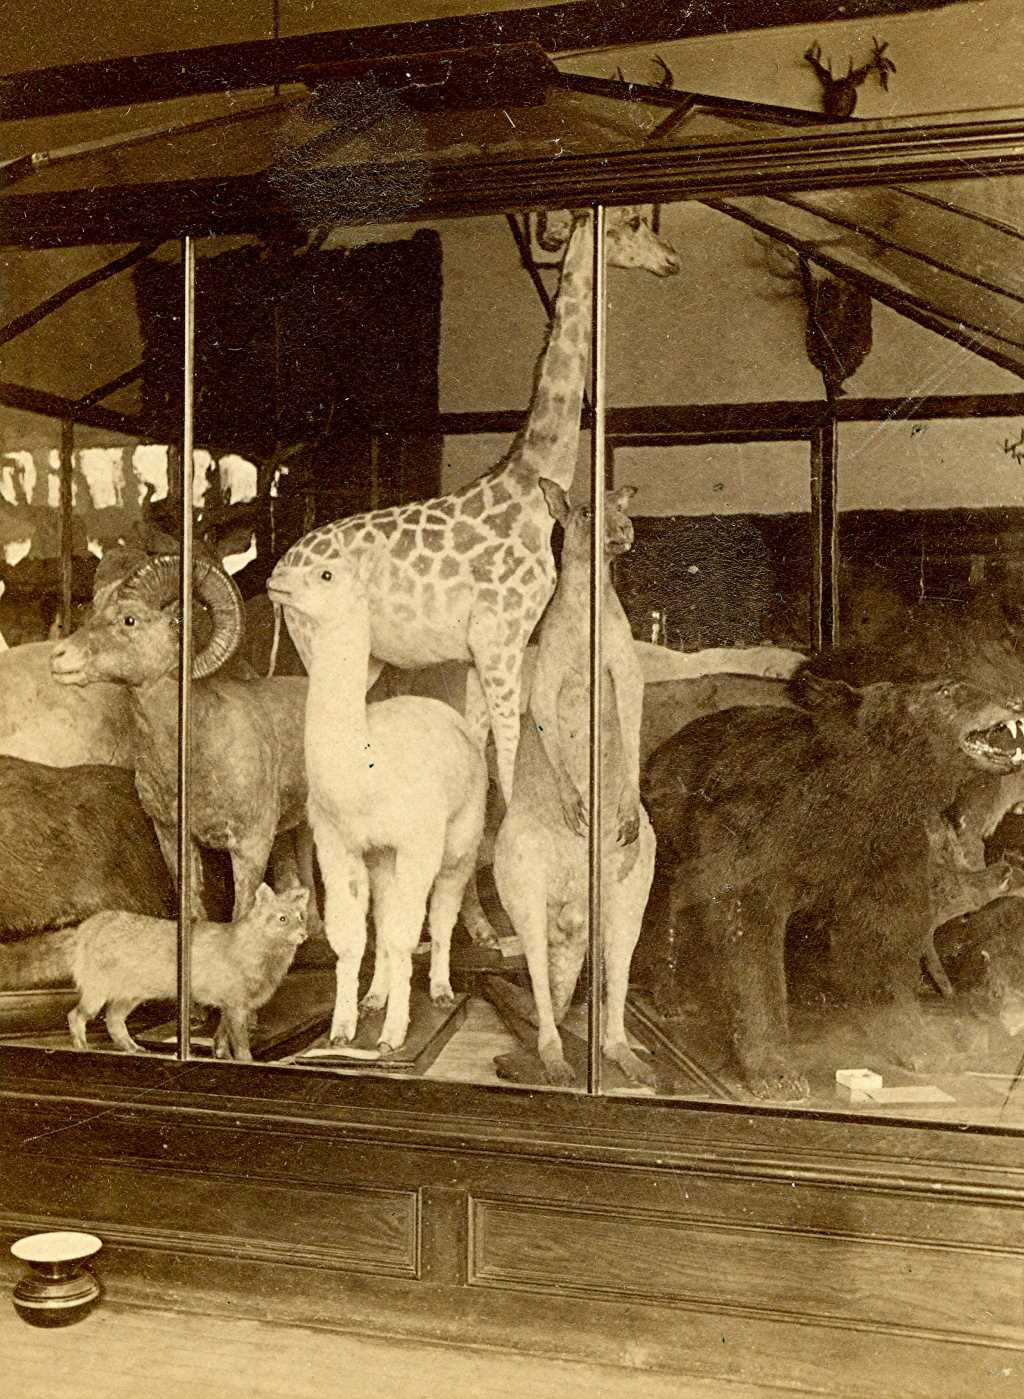 Public Museum Exhibit, 1880s. Image courtesy of Jeff Beutner